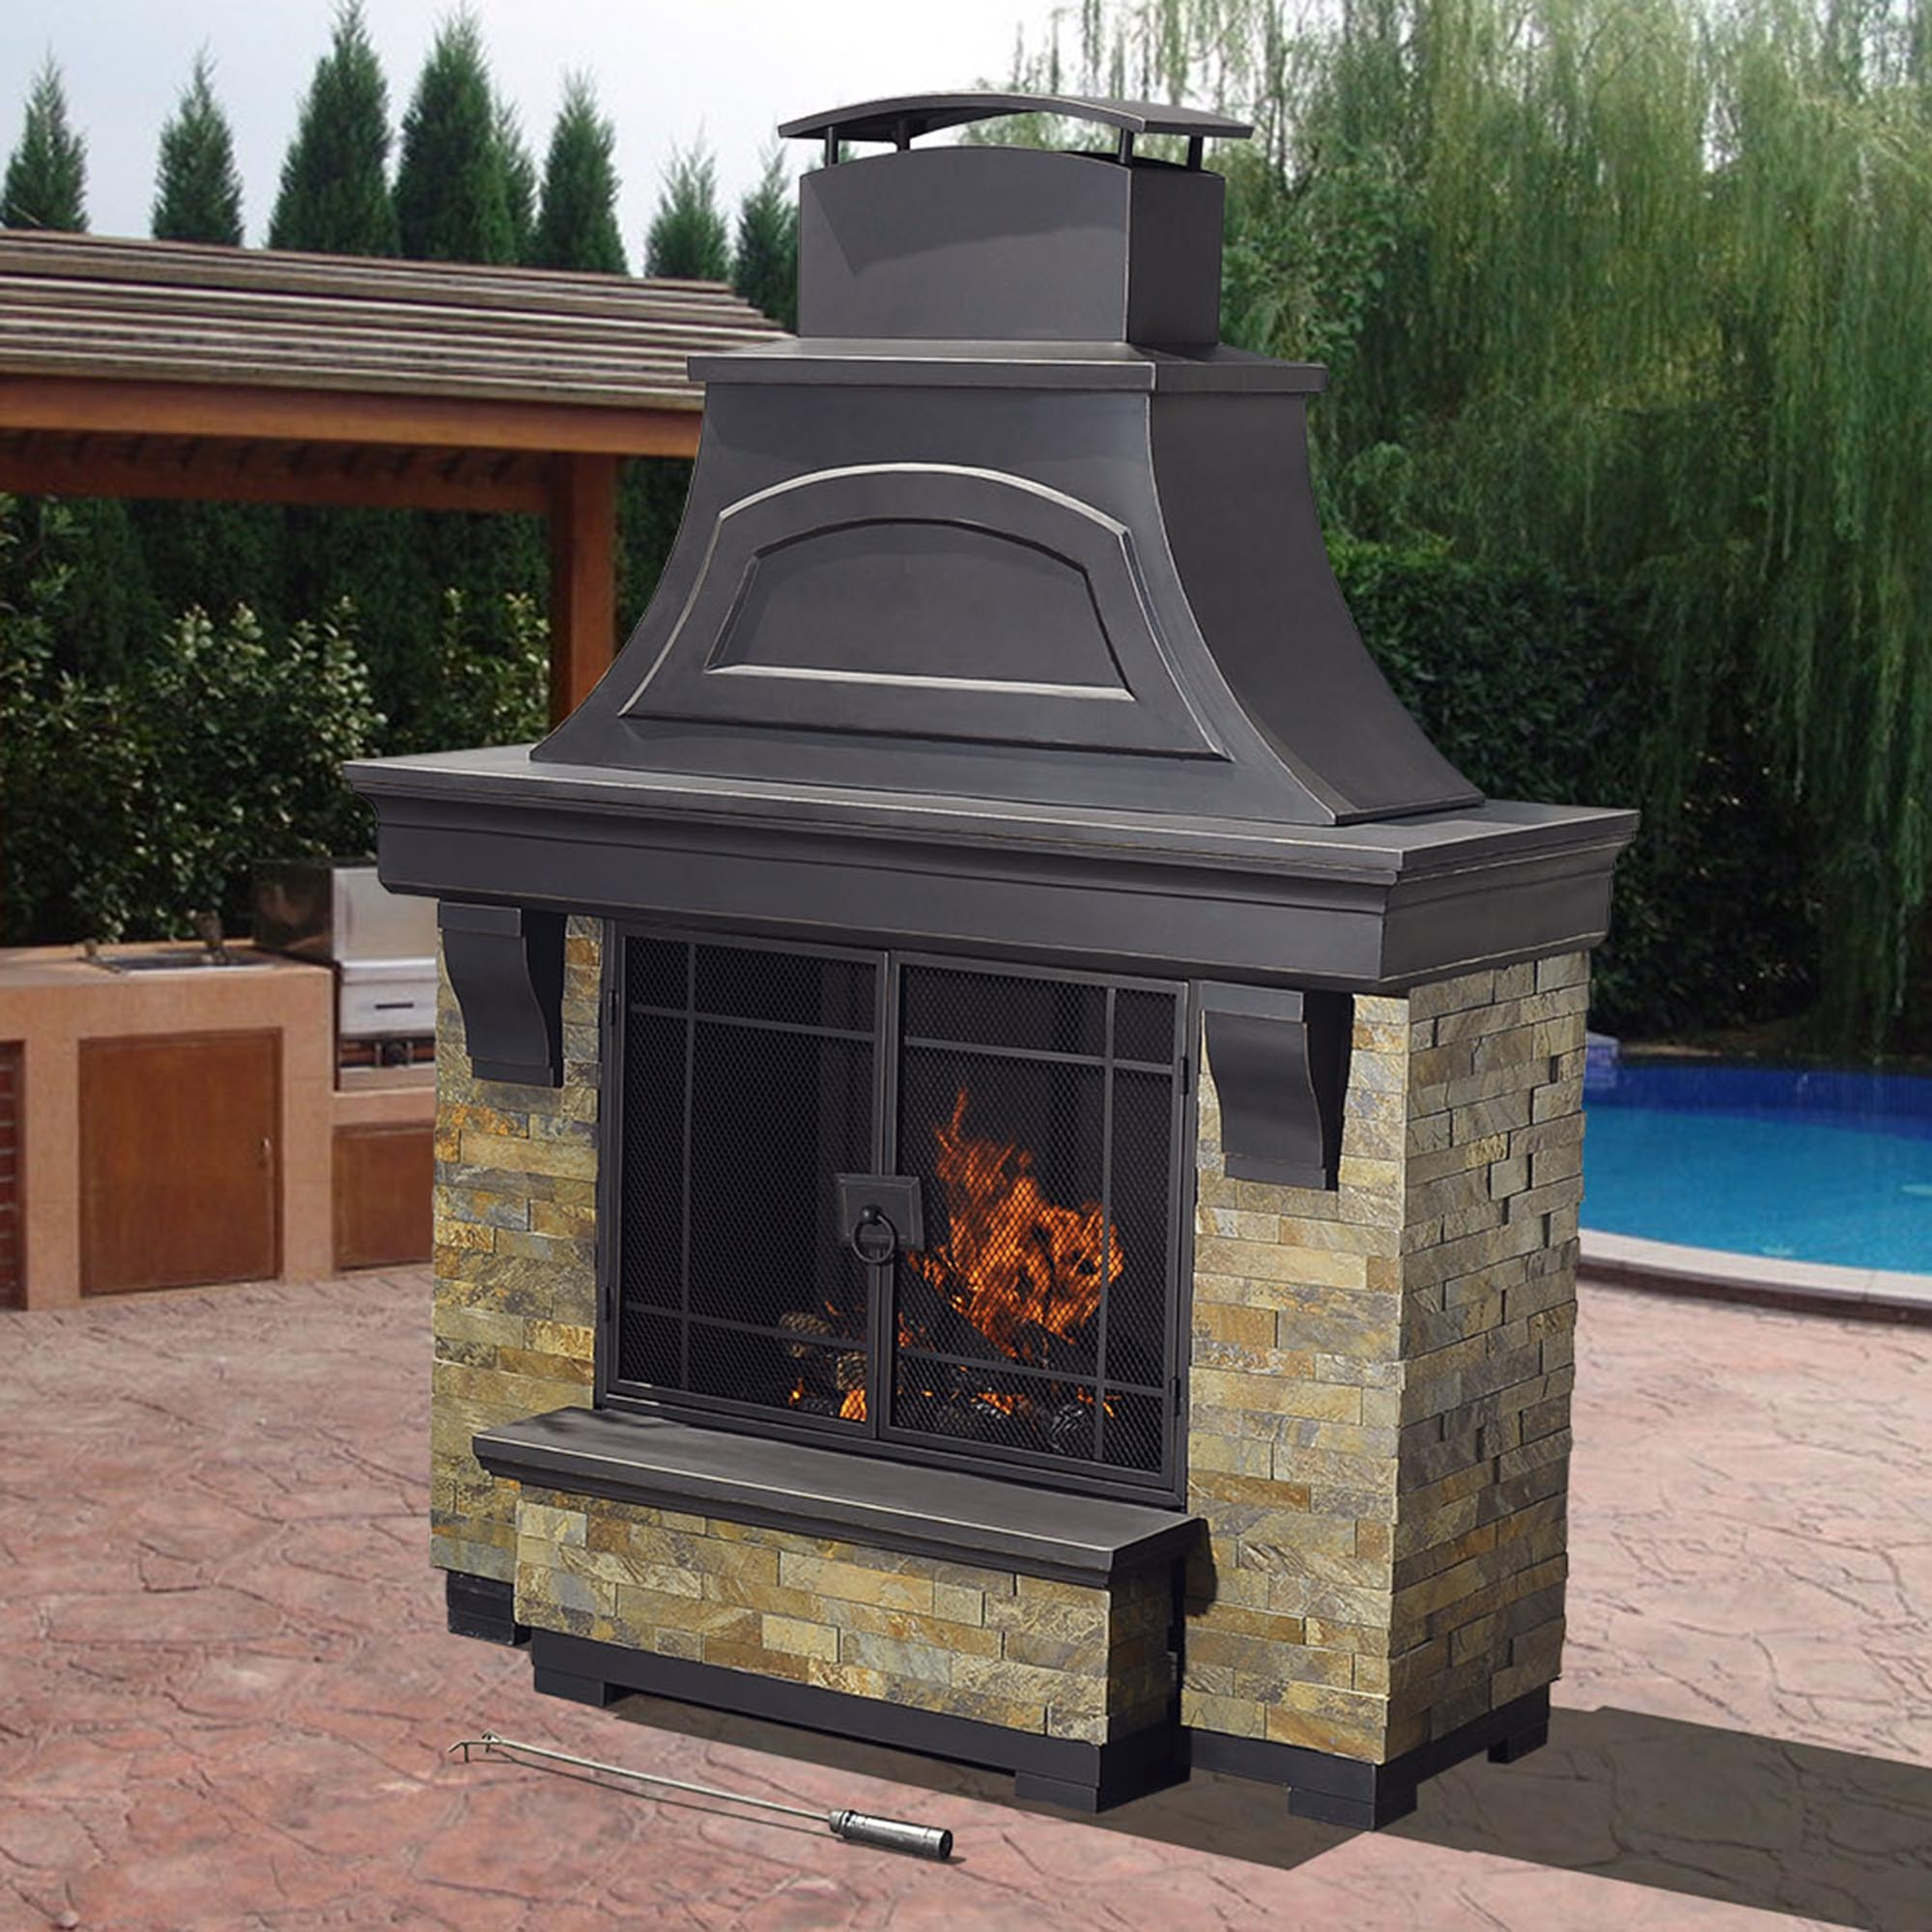 Sunjoy Nutmeg Wood Burning Fireplace on Costco Outdoor Fireplace id=40670